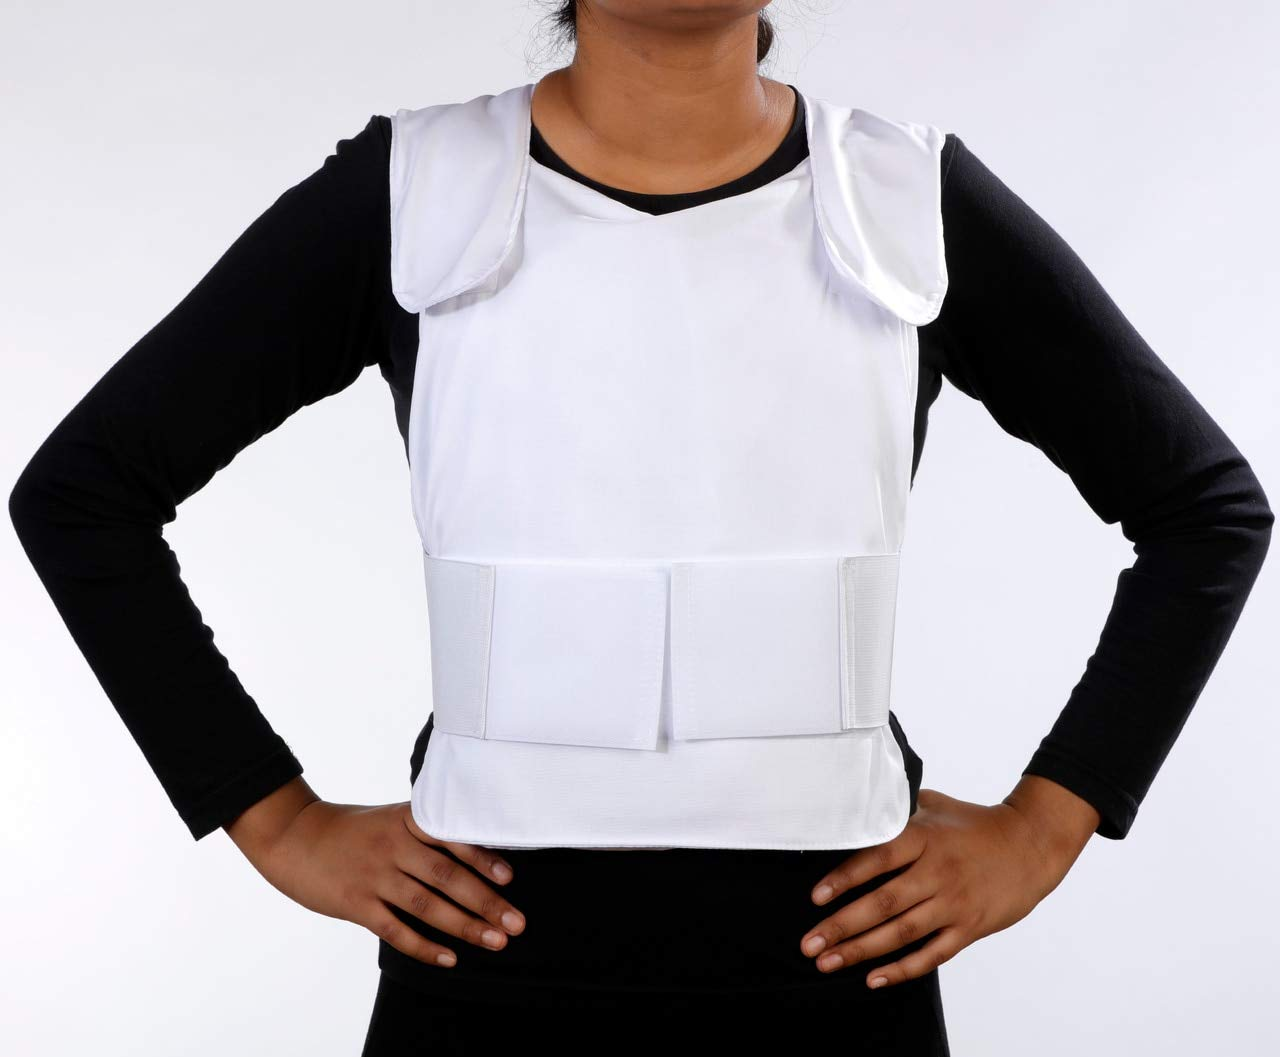 Glacier Tek Concealable Cool Vest with Set of 8 Nontoxic Cooling Packs